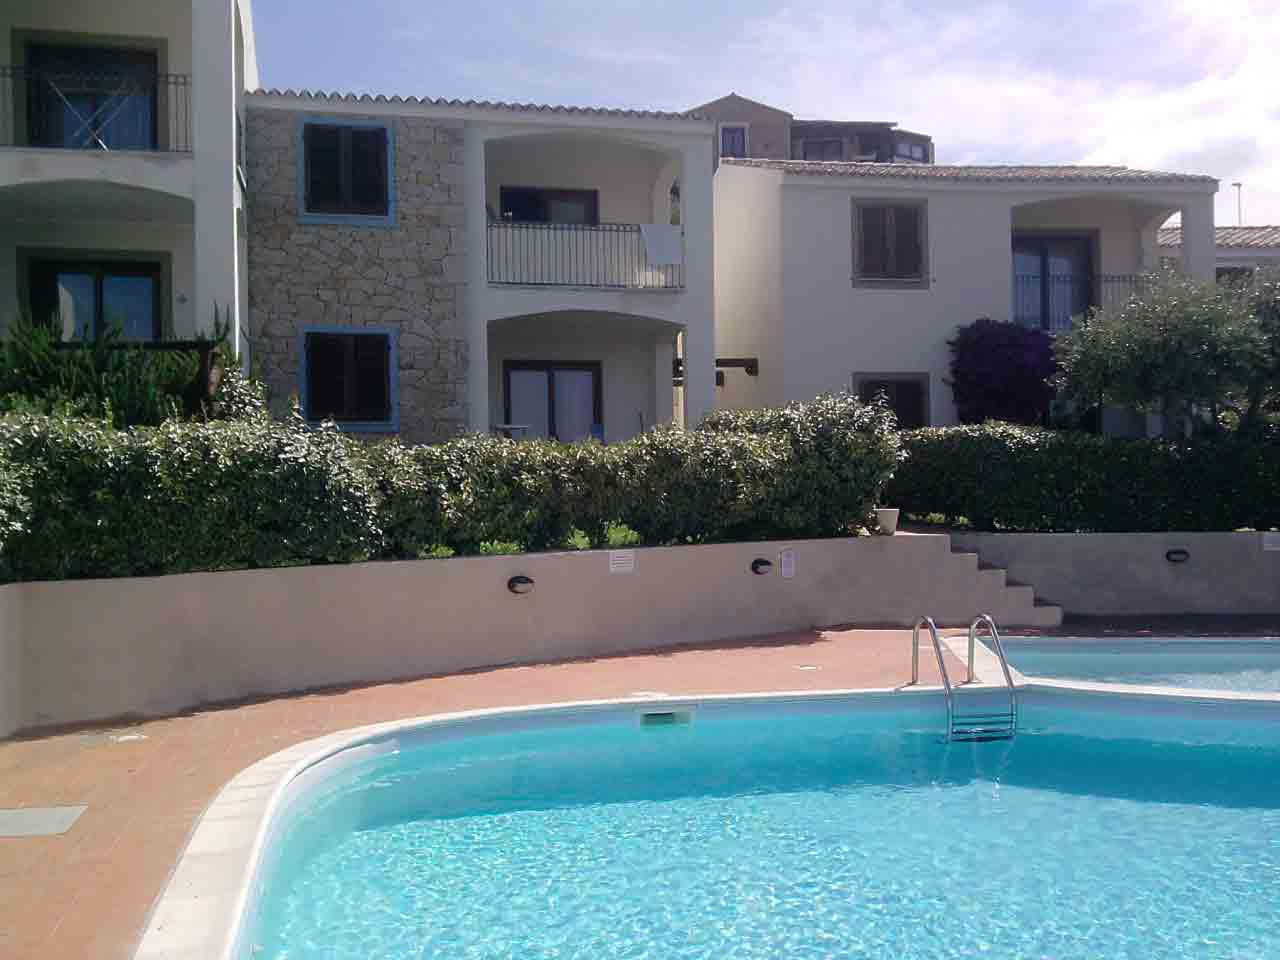 Affitti E Vendite Immobili Sardegna Immobiliare Li